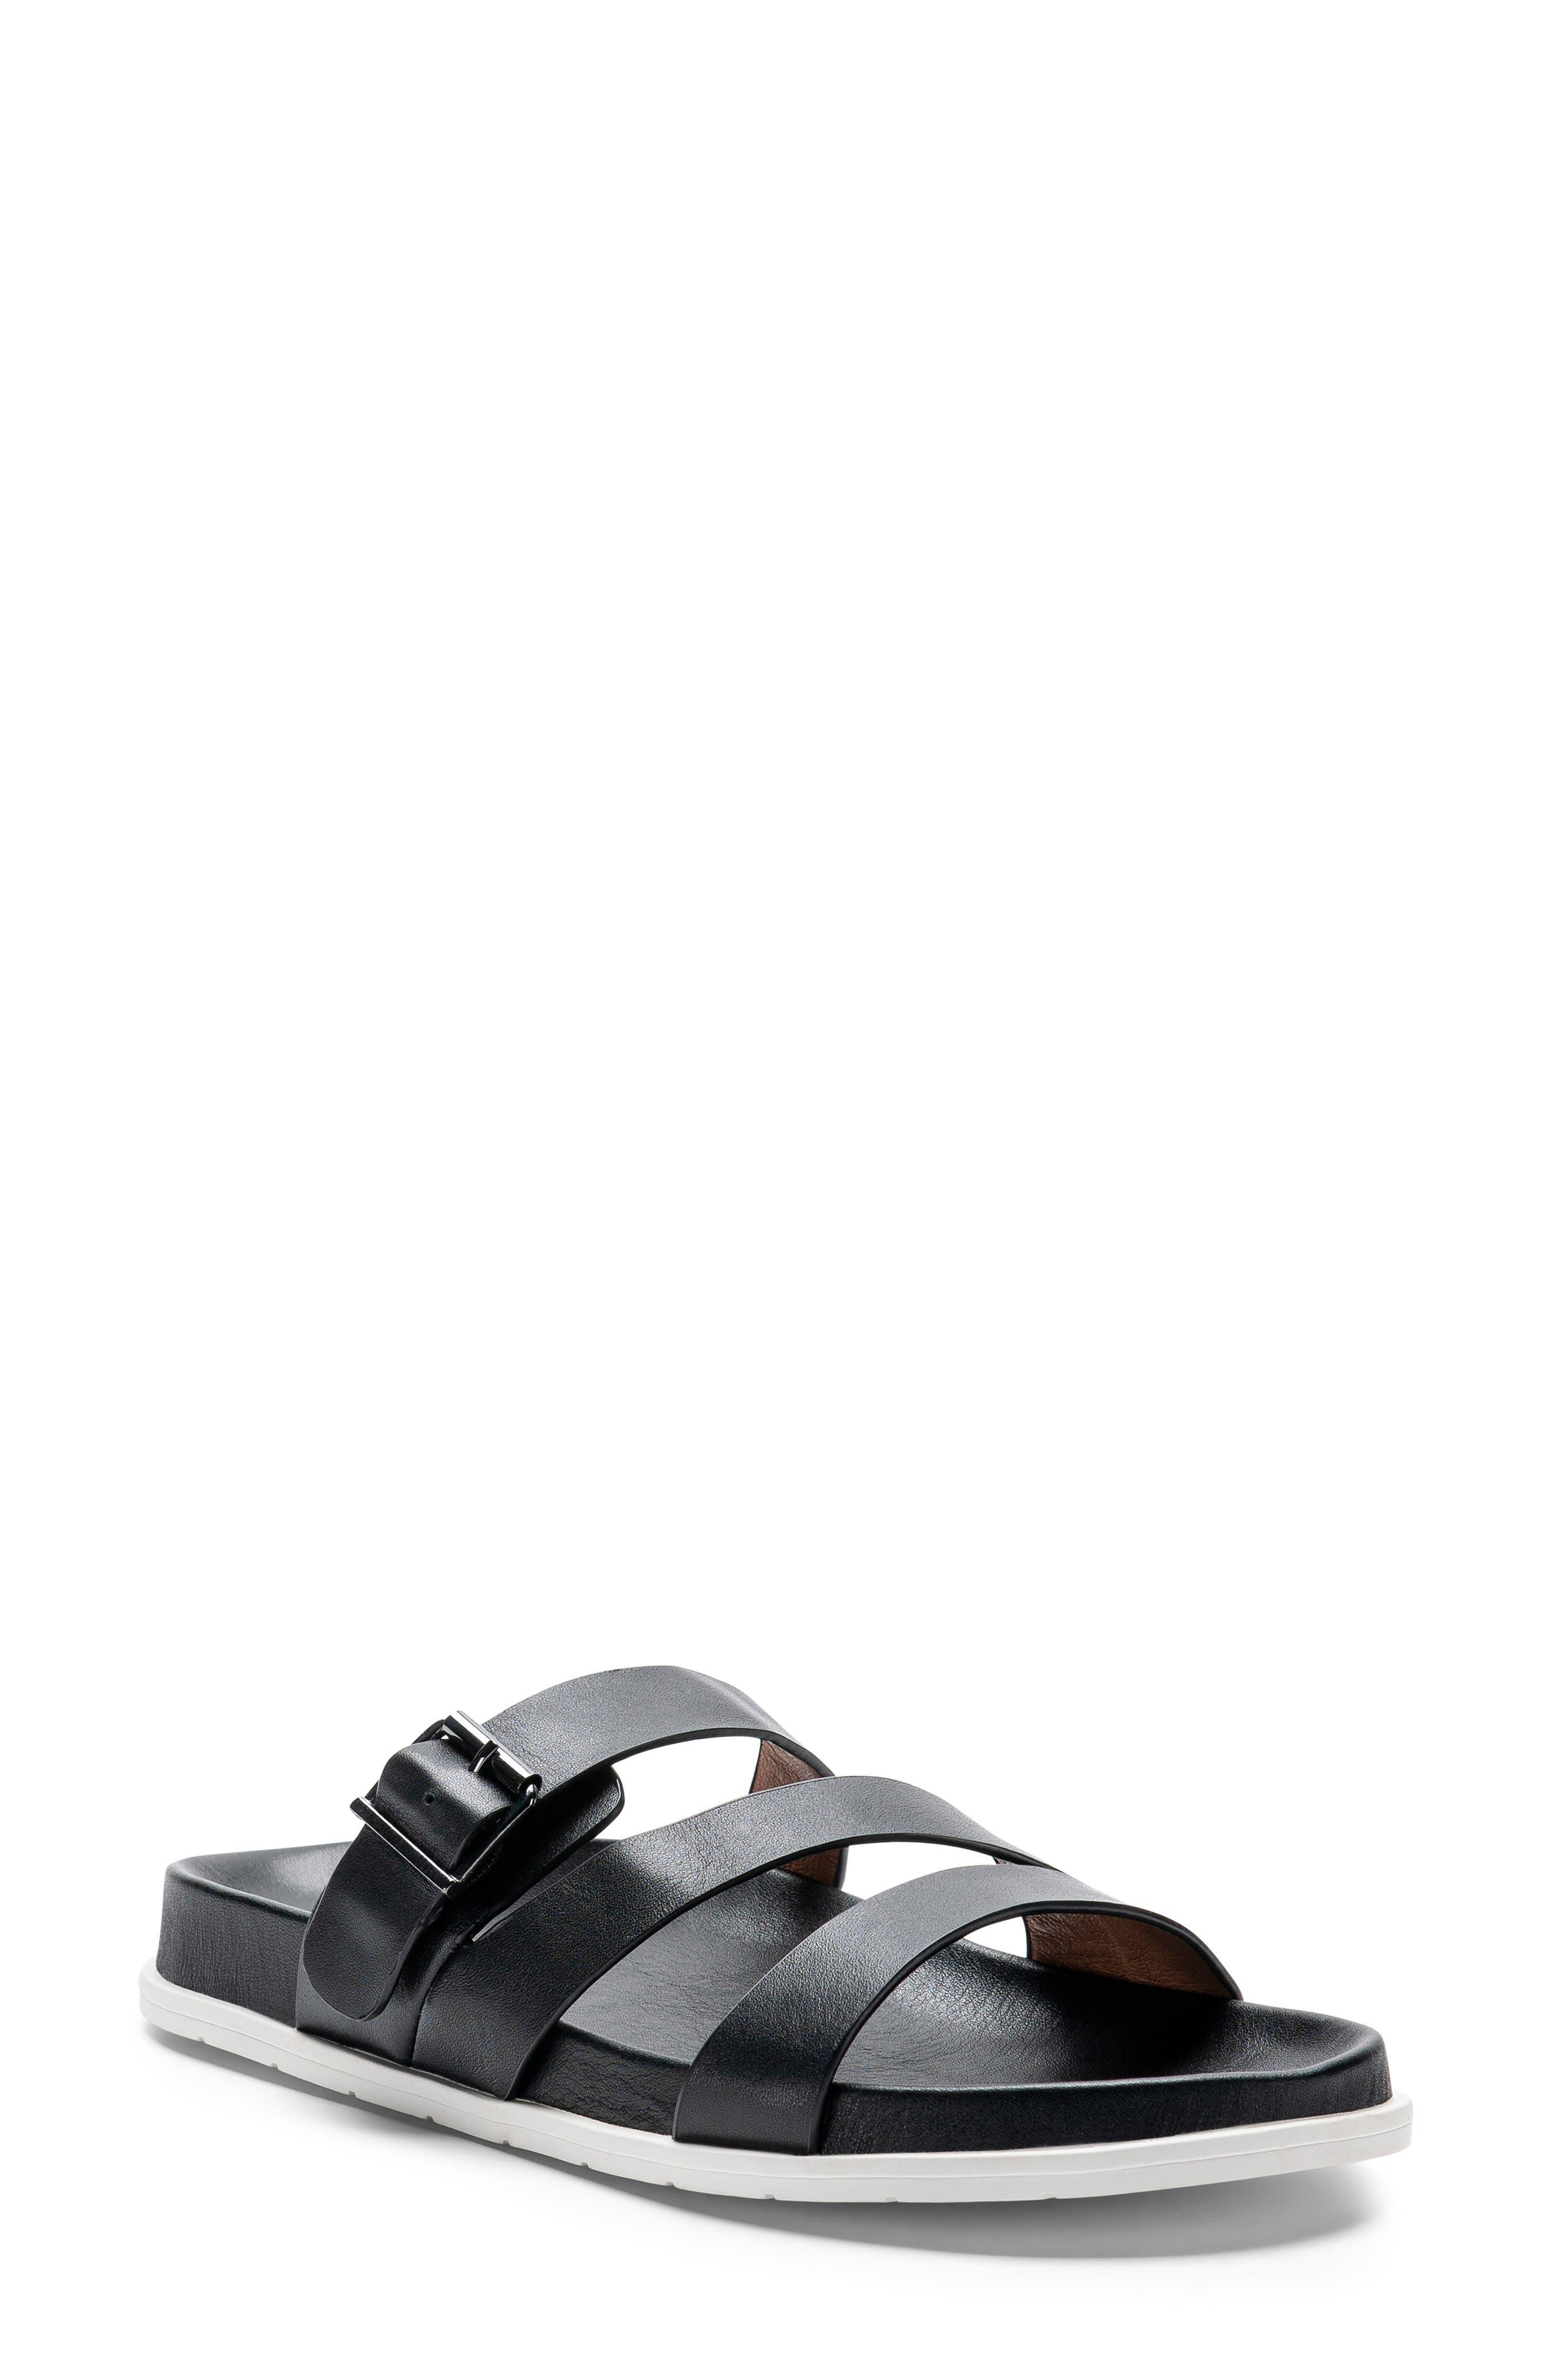 Selma Waterproof Slide Sandal, Main, color, BLACK LEATHER